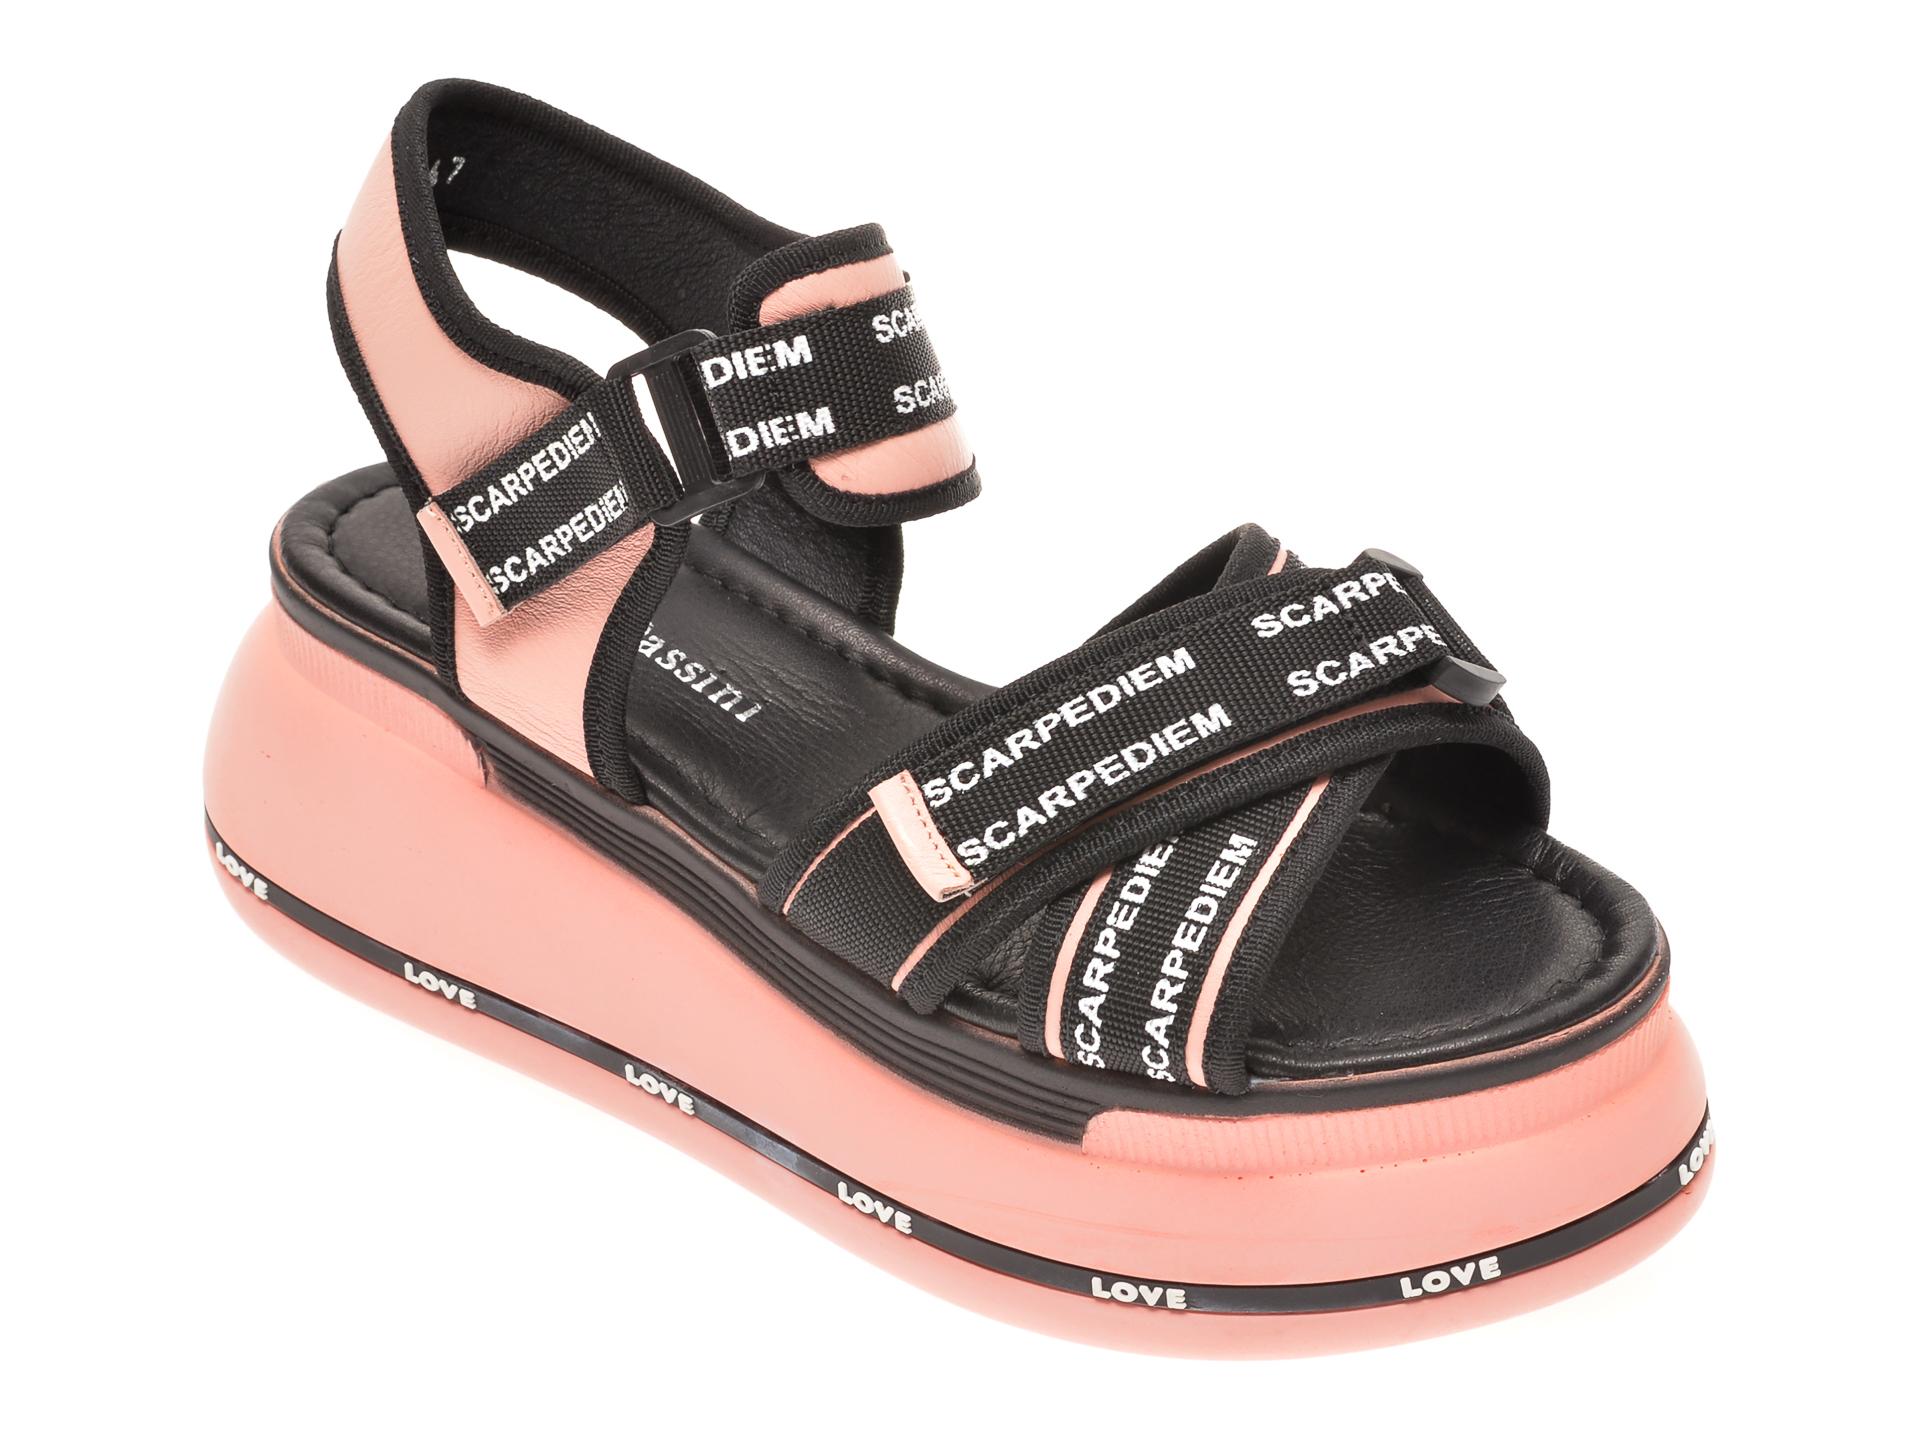 Sandale FLAVIA PASSINI roz, 1182381, din piele naturala